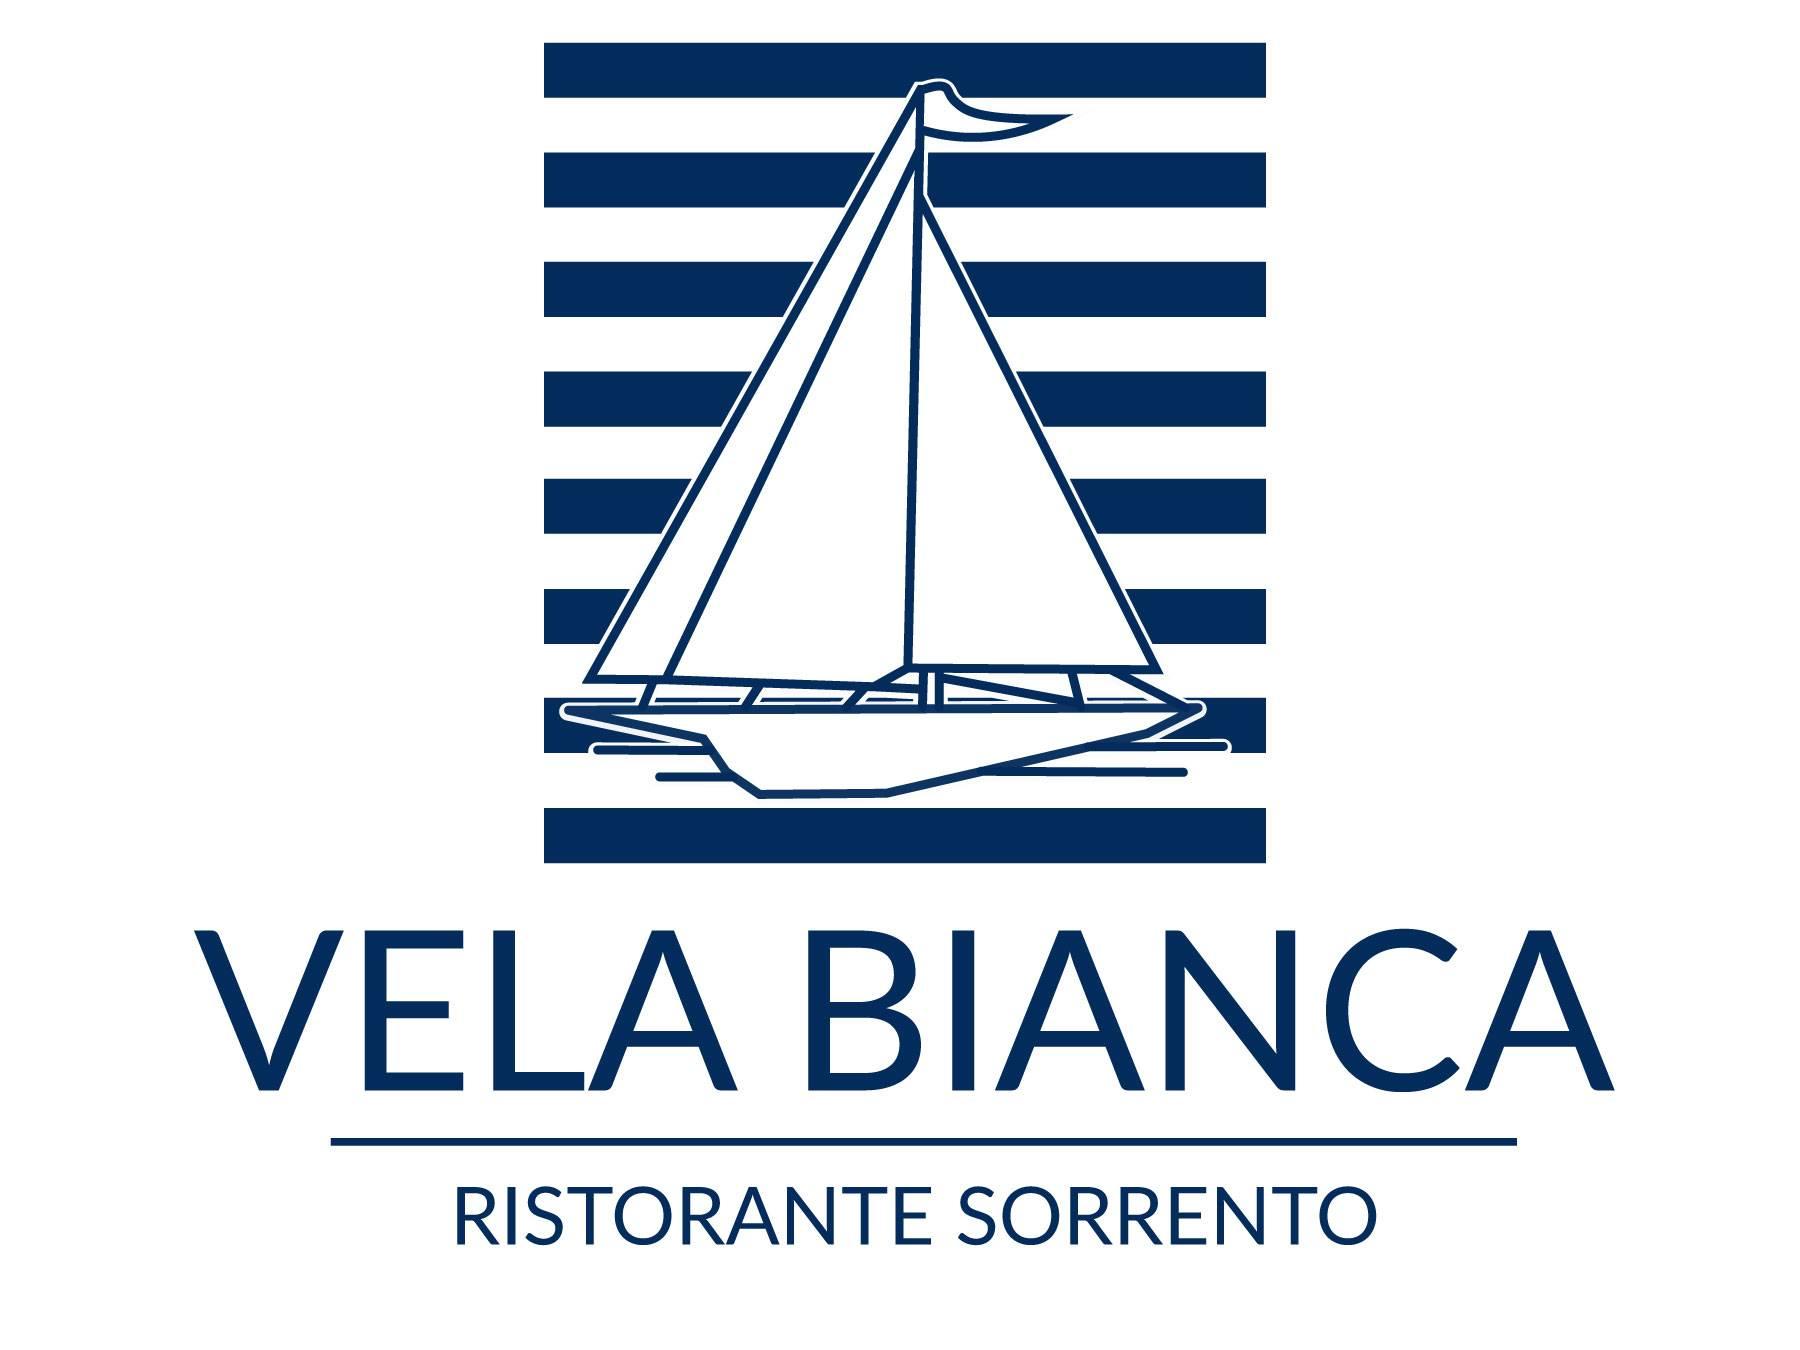 Restaurant Vela Bianca Sorrento Seafood Restaurant In Sorrento